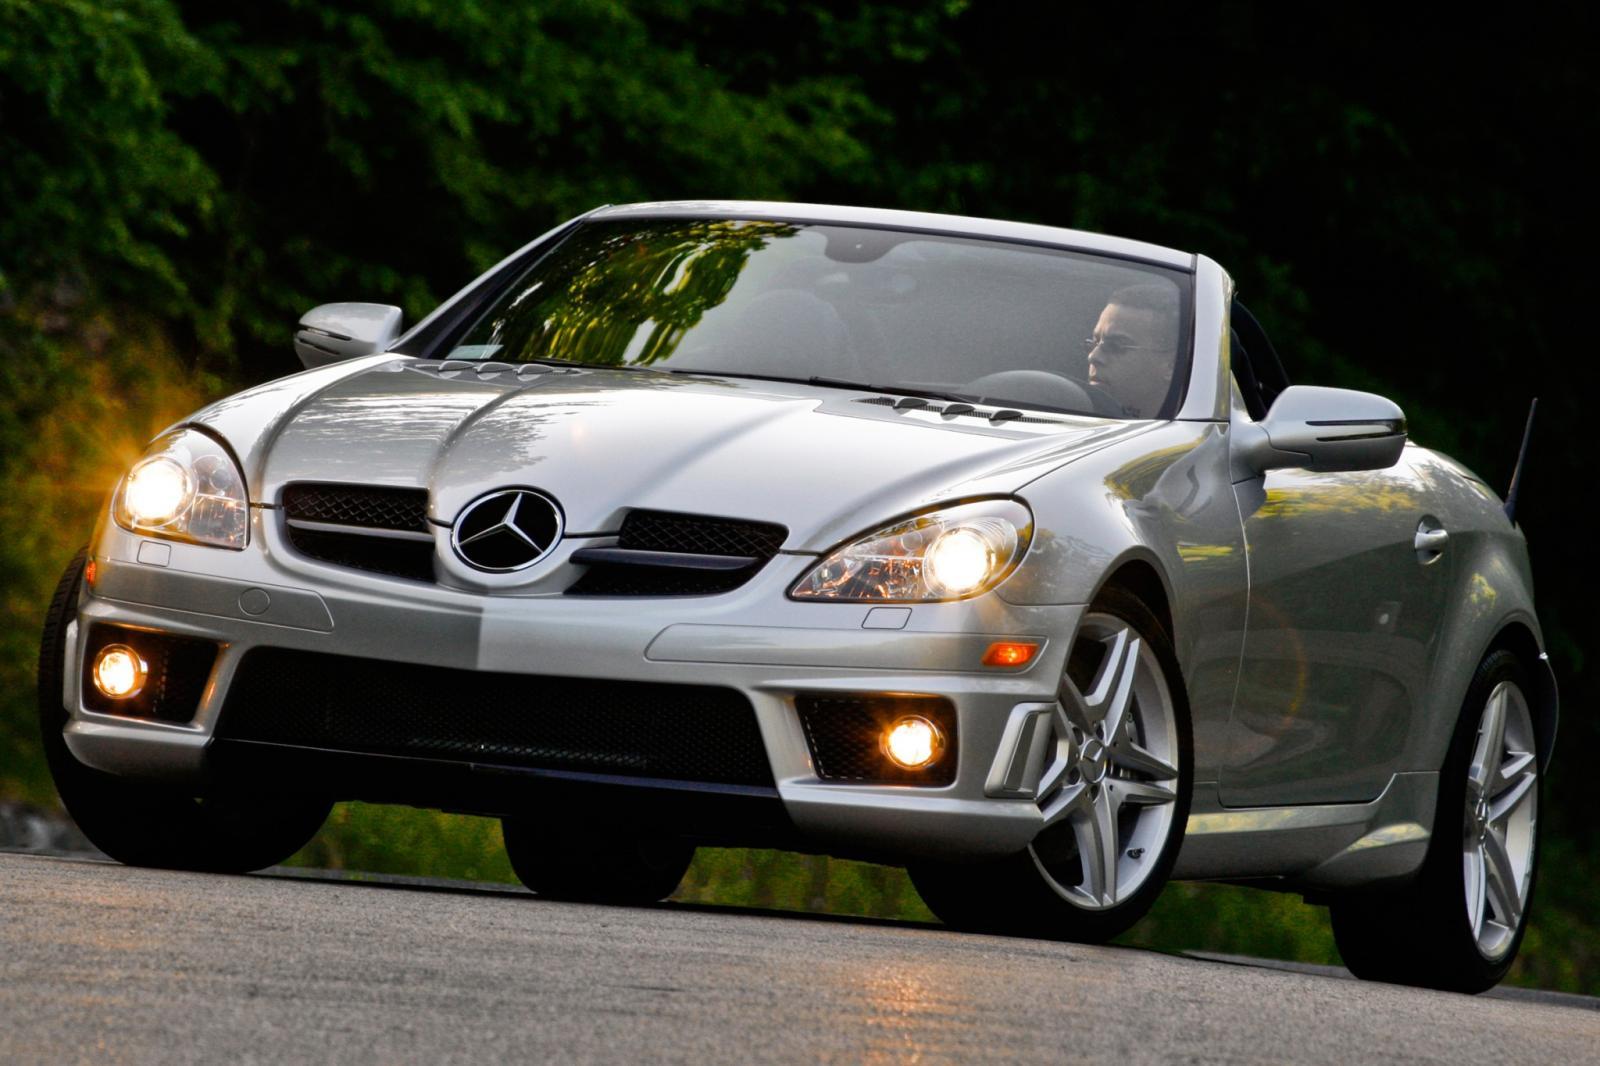 2010 mercedes benz slk class information and photos for Mercedes benz slk